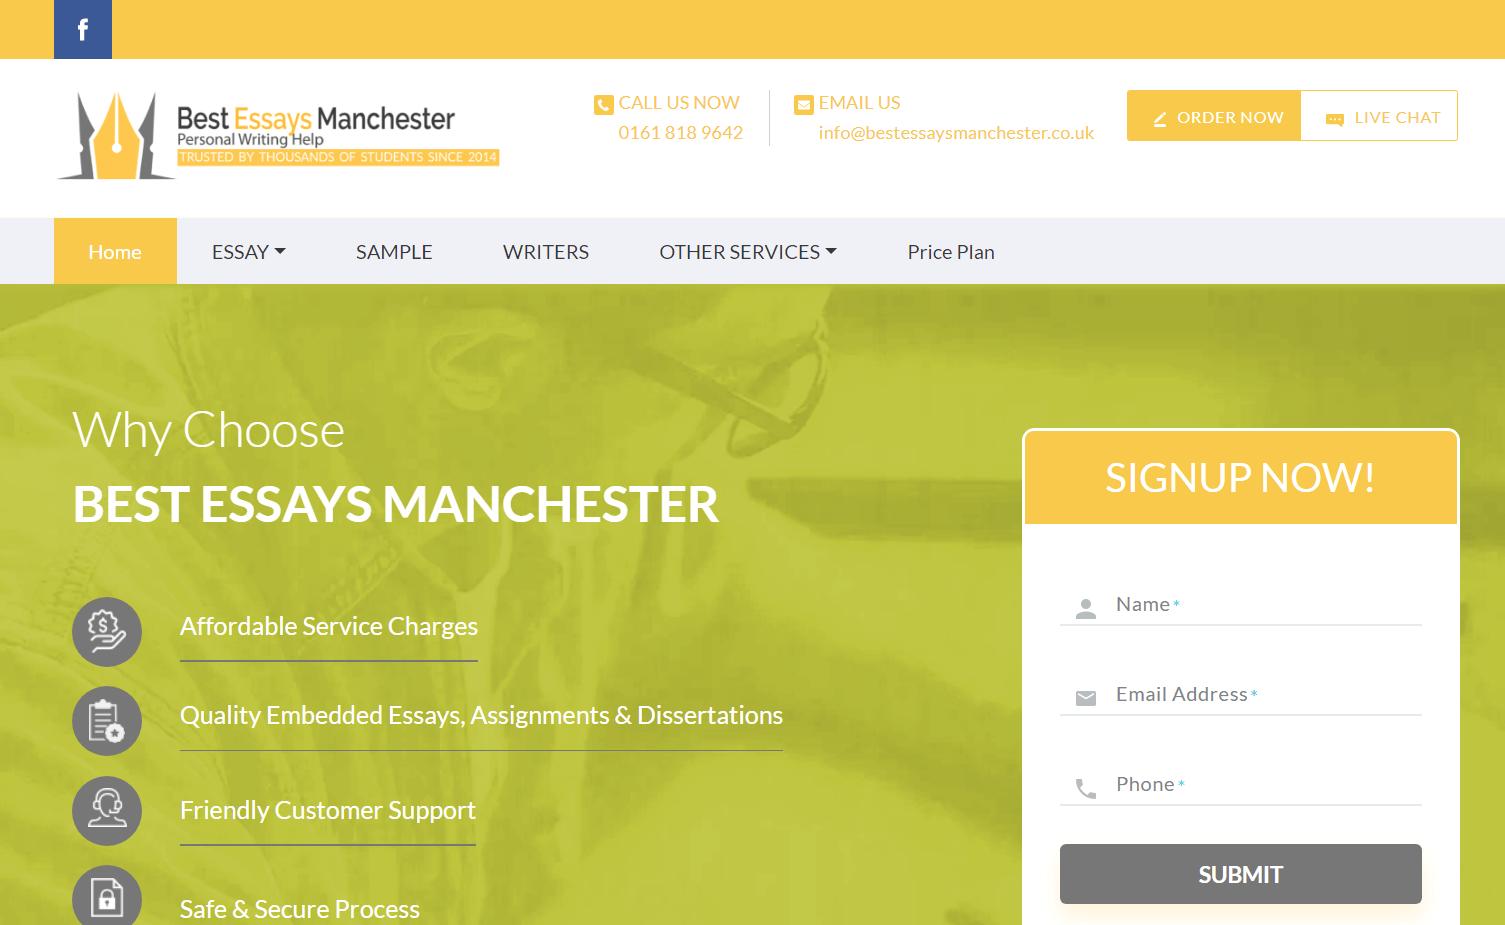 bestessaysmanchester.co.uk